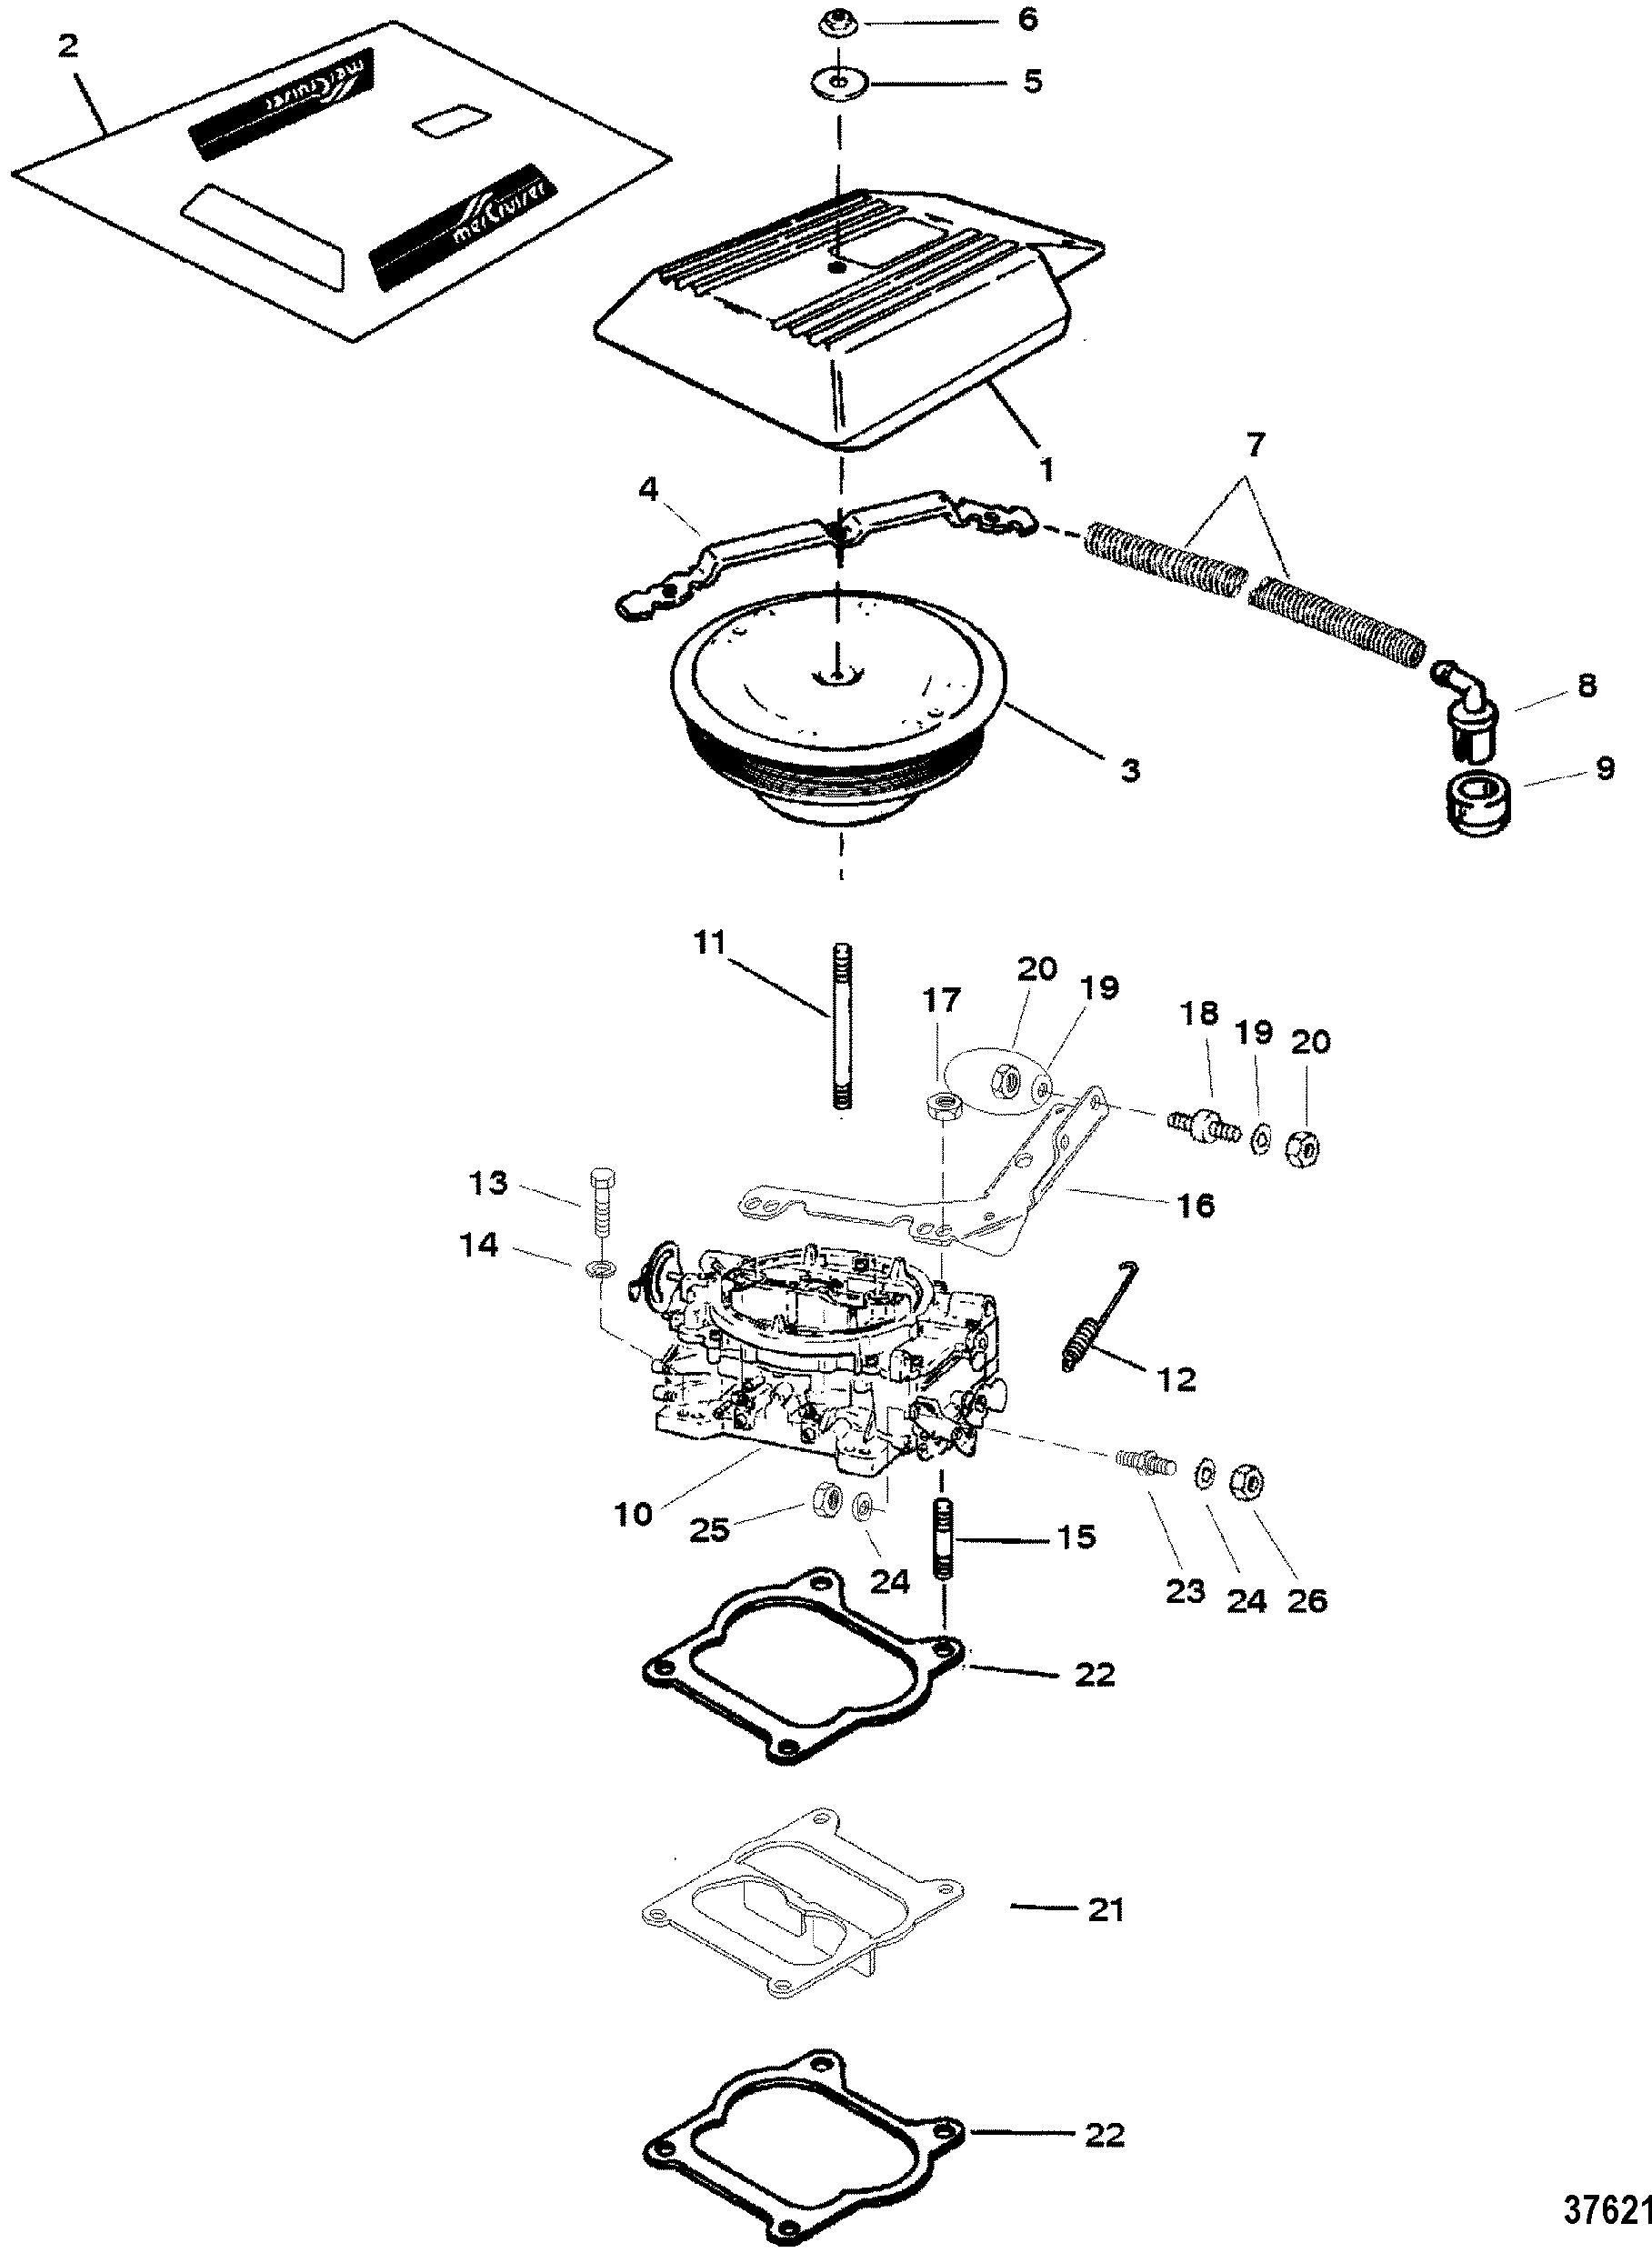 CP Performance - Carburetor-Throttle Linkage (4 Barrel) on